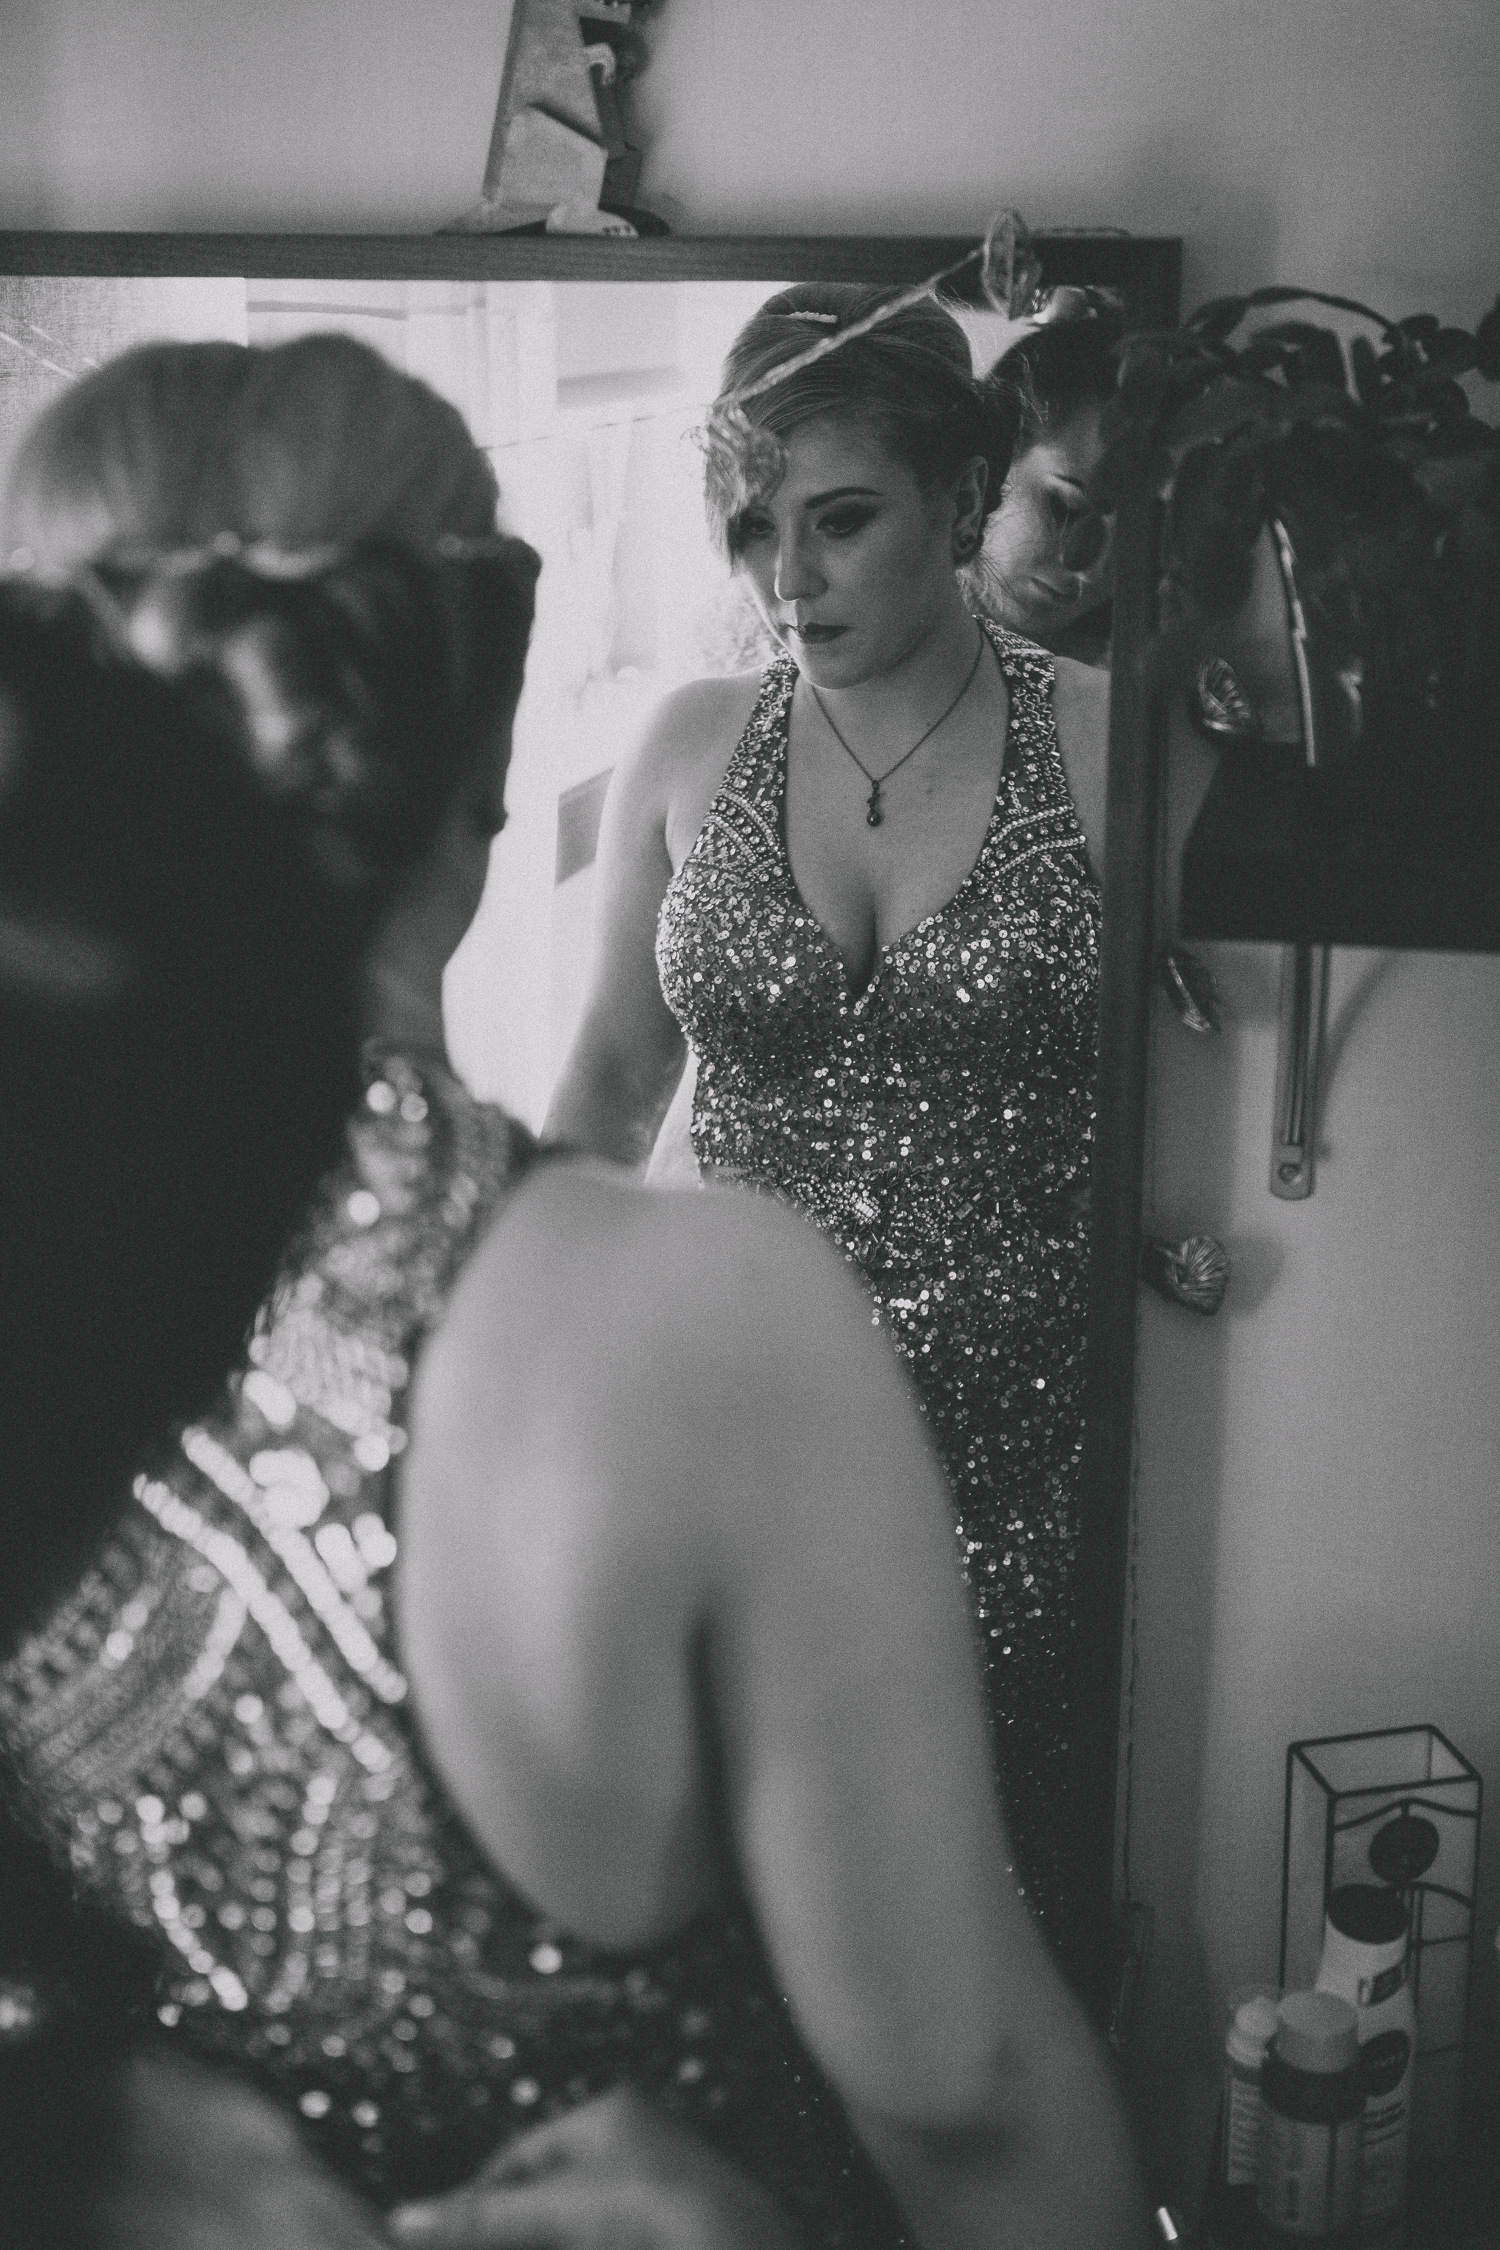 Alternative_wedding_photographer_scotland_glasgow-cottiers-29.jpg